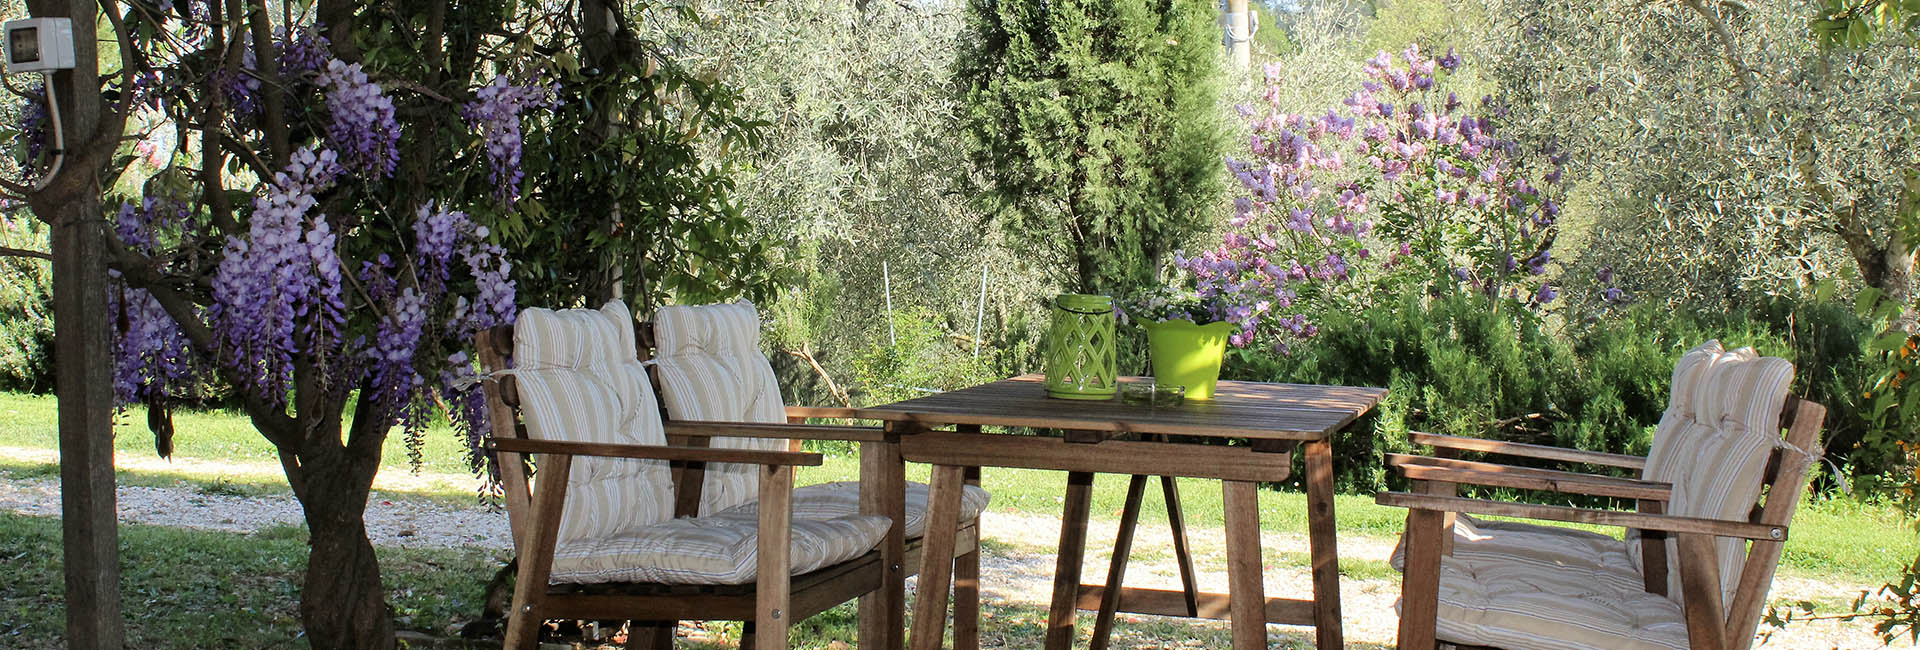 Agriturismo in Umbria - ambiente relax all'aperto